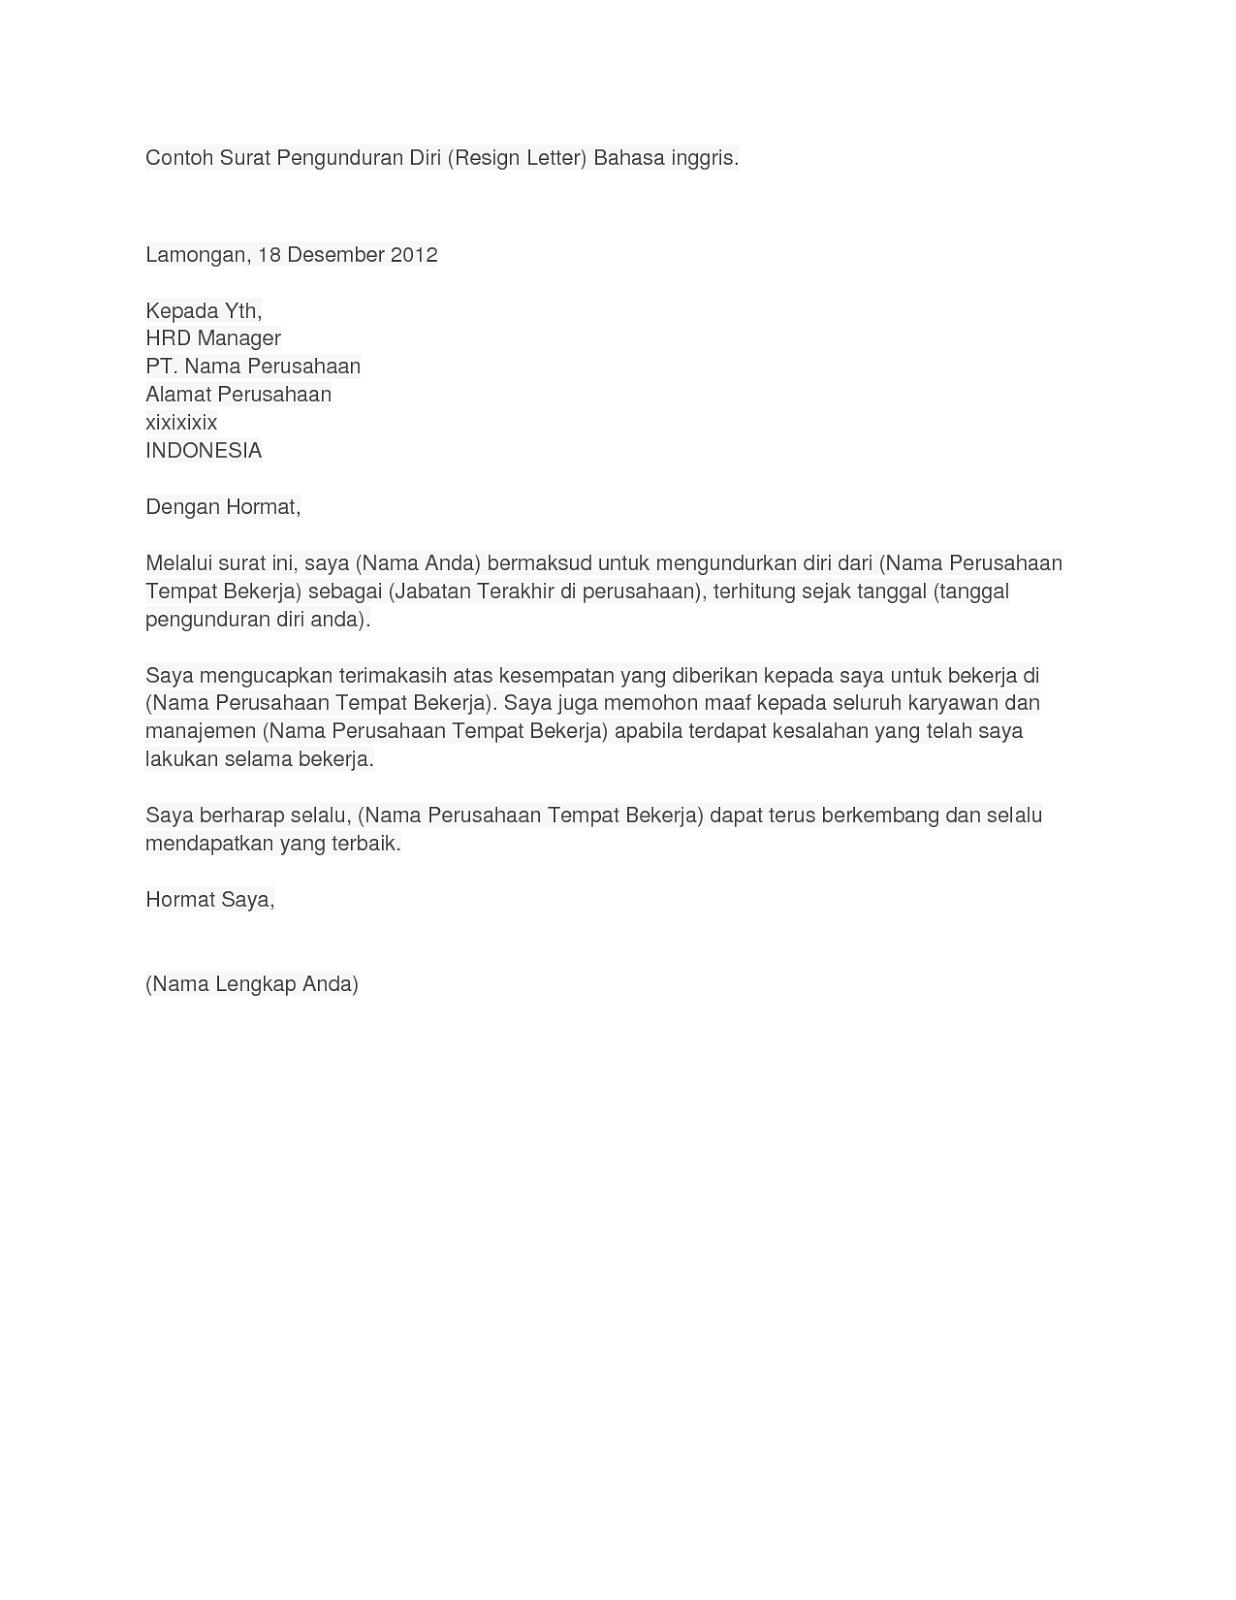 Surat Pengunduran Diri Contoh Surat